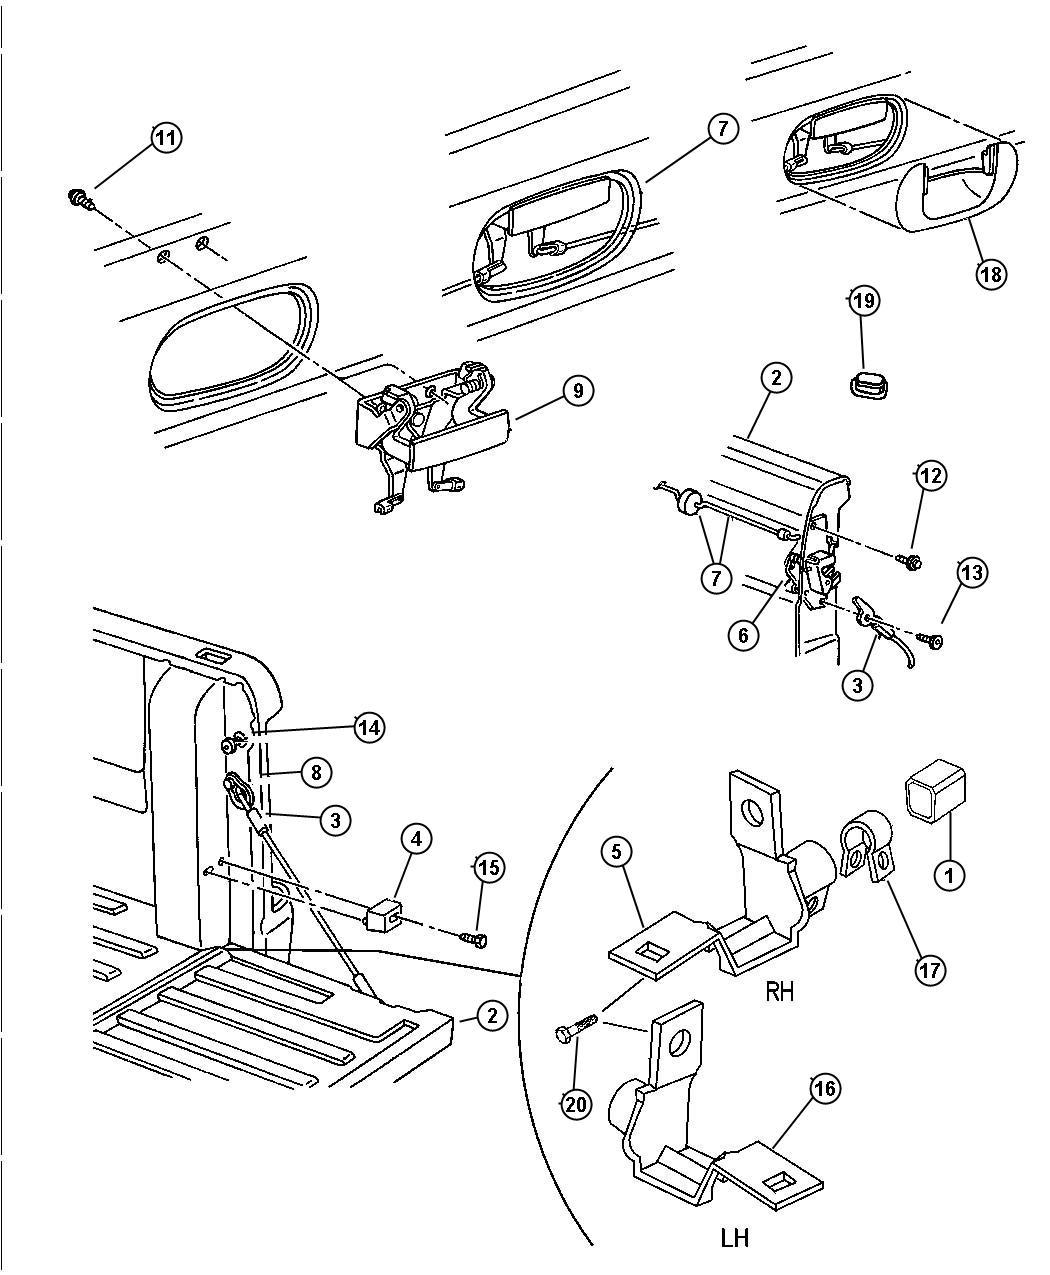 Dodge Ram Screw 312 18x3 00 Screw Tailgate Mounting Tailgate Mtg